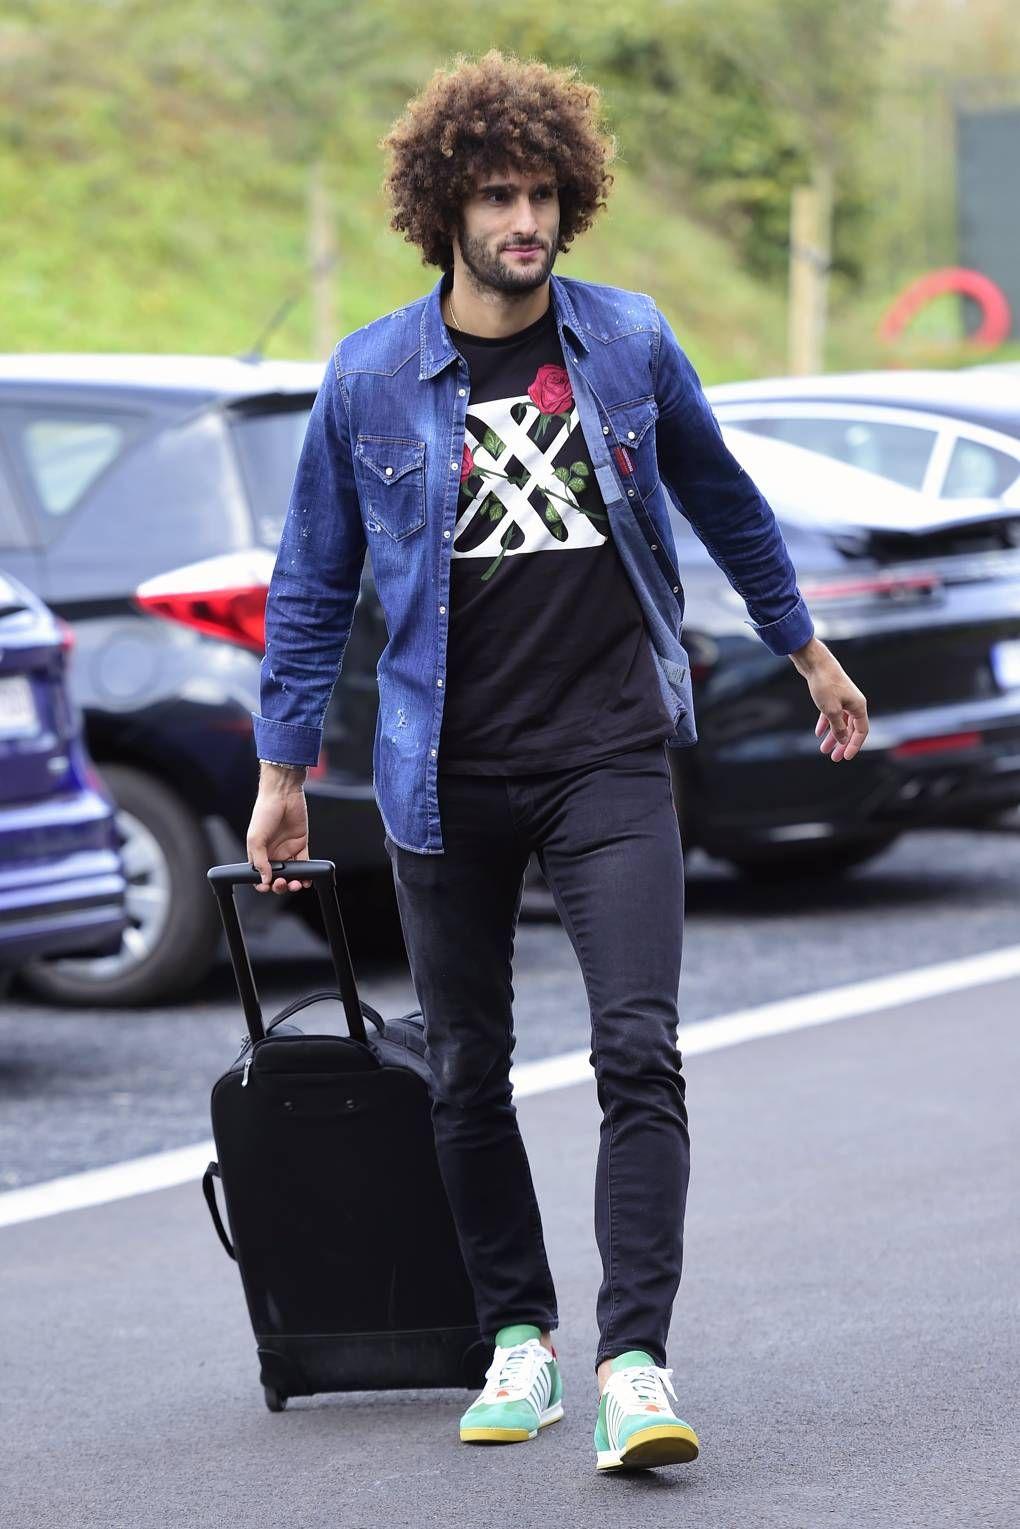 Piala Dunia 2018: 10 Pesepak Bola Paling Modis yang Bikin Hatimu Meleleh